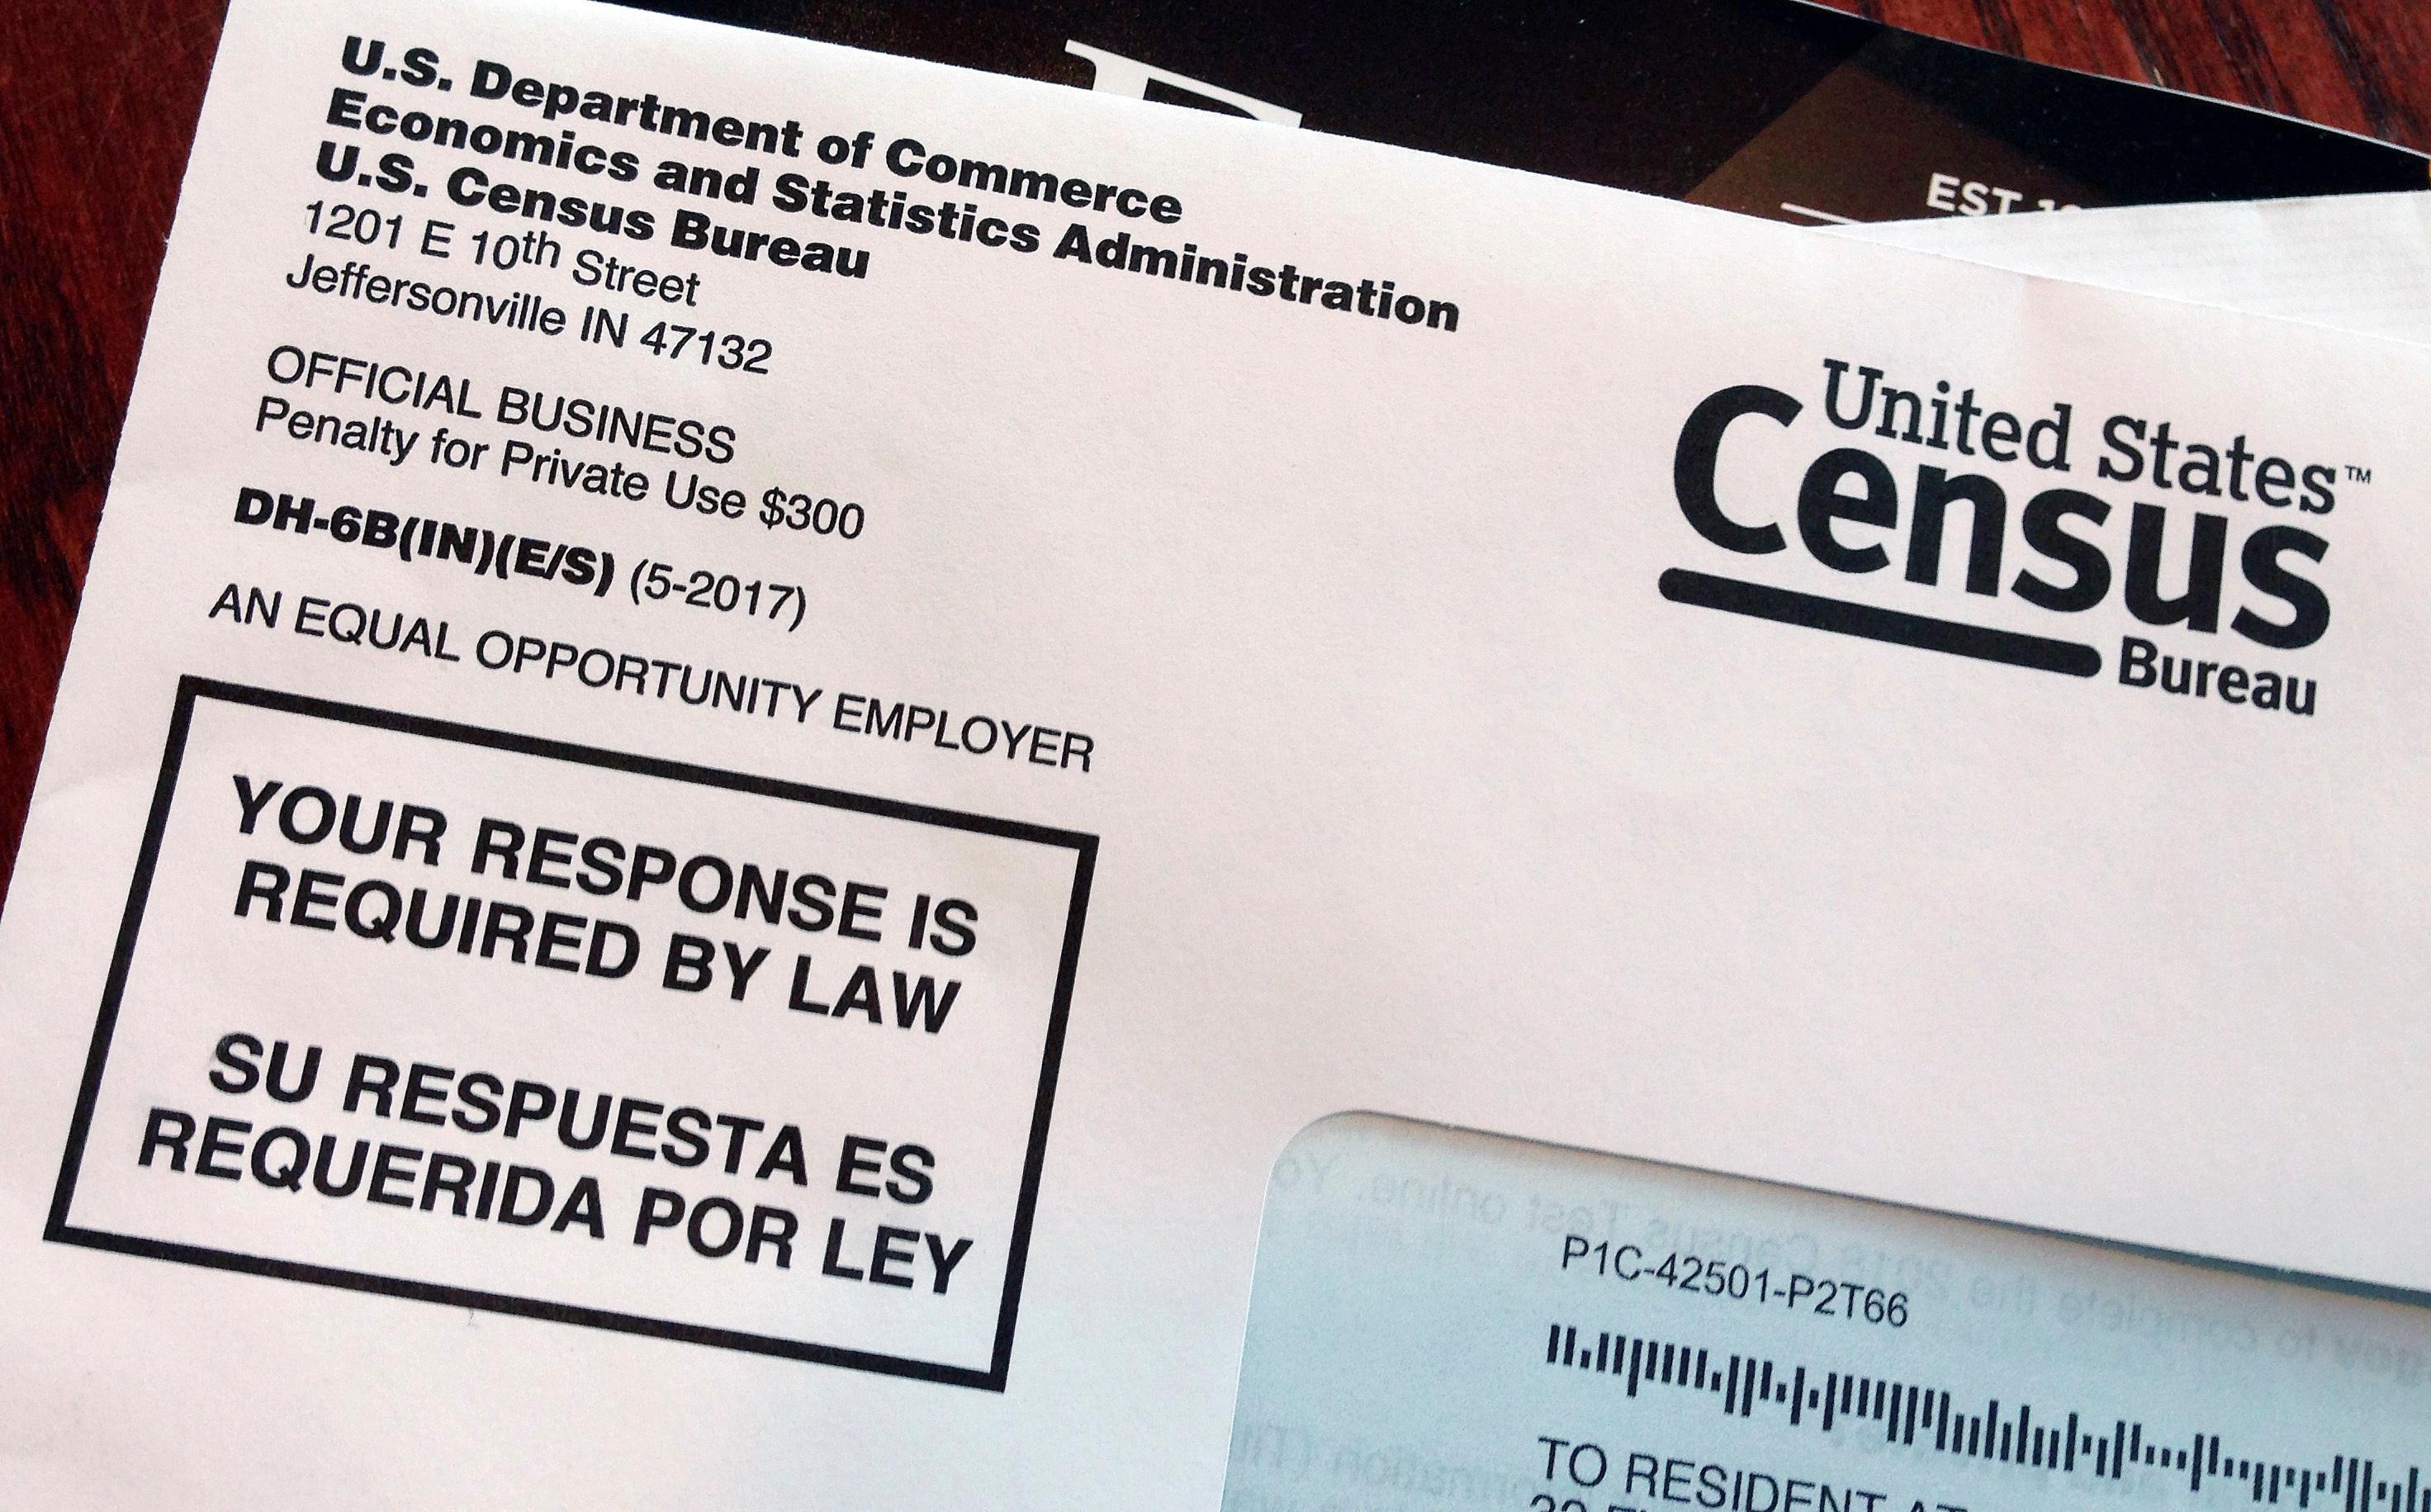 Oficina del Censo busca datos sobre estatus legal